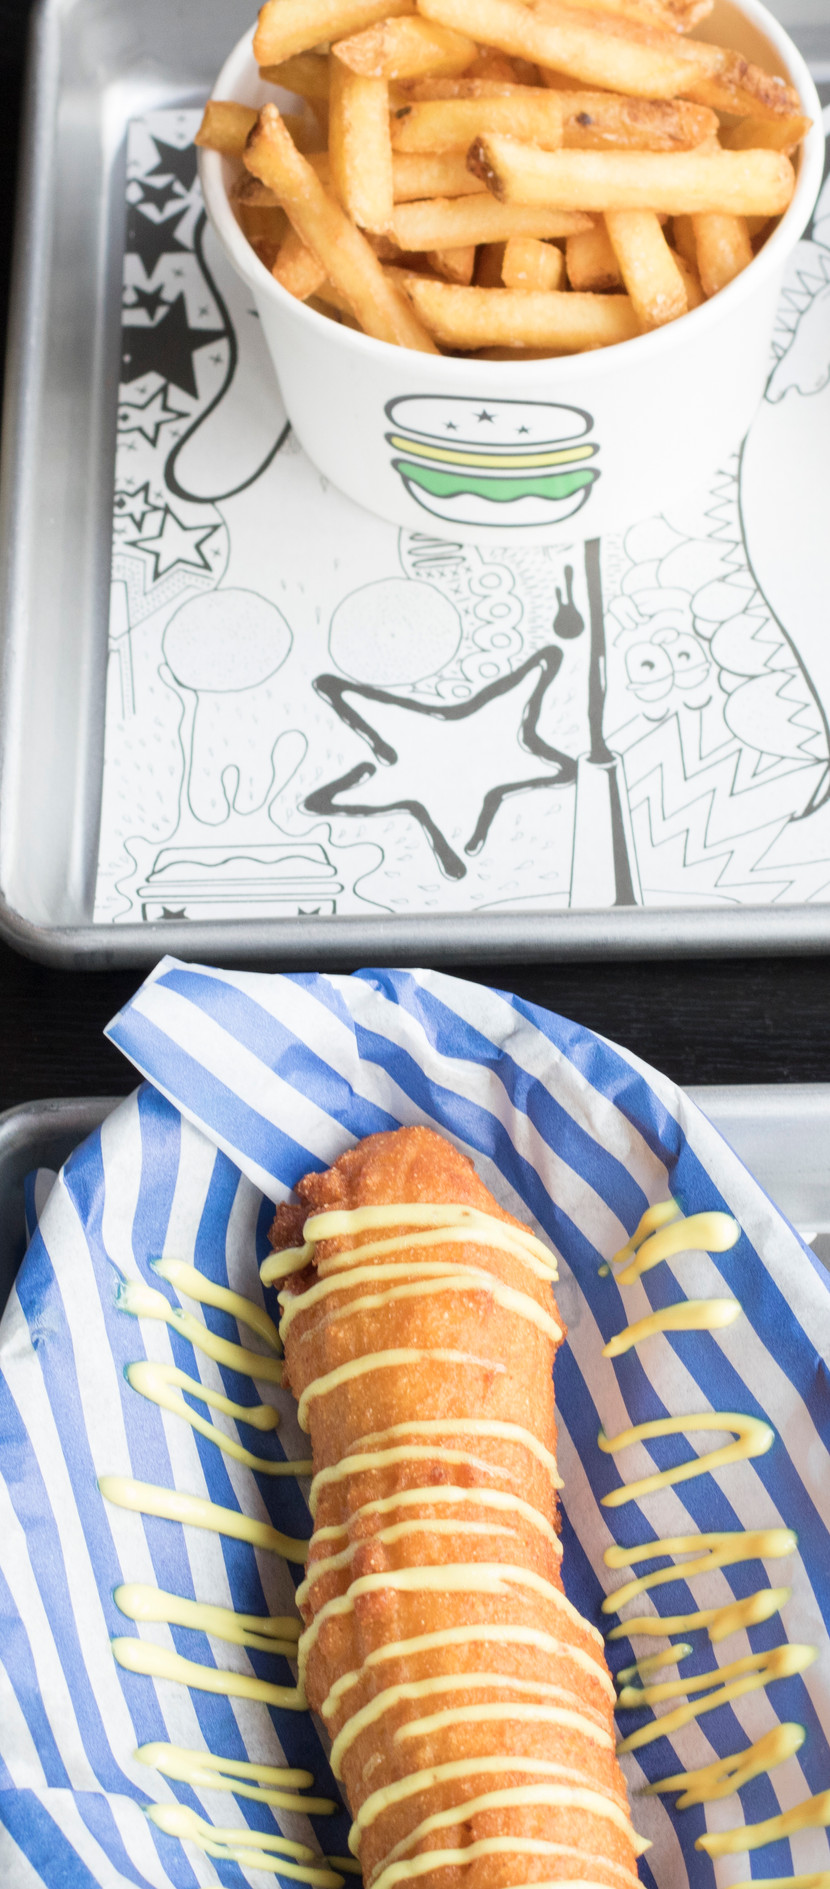 UBER EATS - Libertine Burgers, Leamington Spa